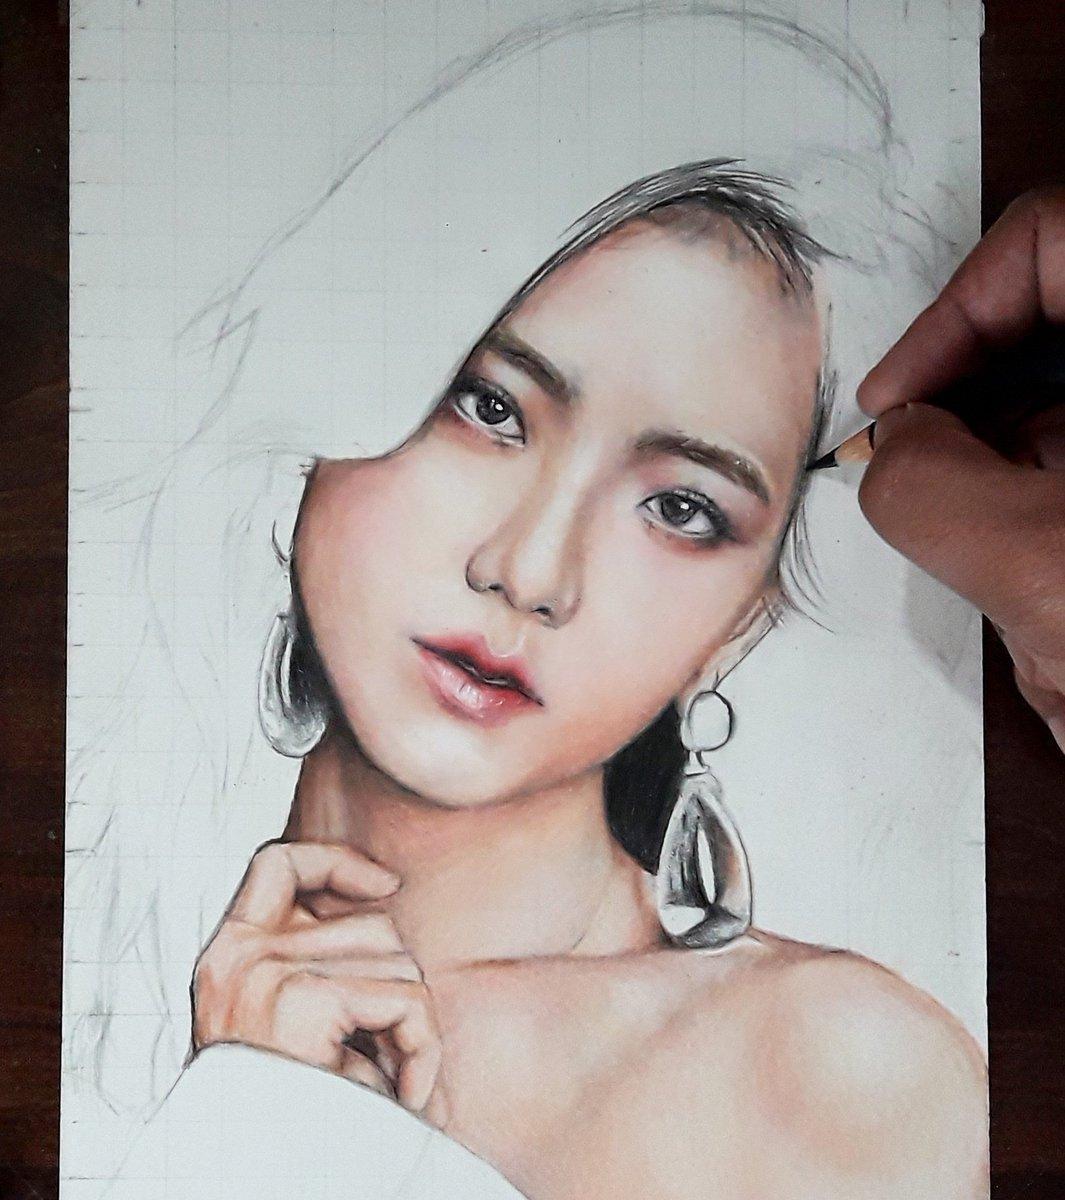 JISOOOOO  My First drawing of 2019 #JISOO #jisooblackpink #BLACKPINK #MissKoreaJisooDay #BLACKPINKINTHAIAREA #jennie #ROSÉ #LISA #Drawing #art #artist #black #kpopfanart #kpop <br>http://pic.twitter.com/0hZ8TE1KVi